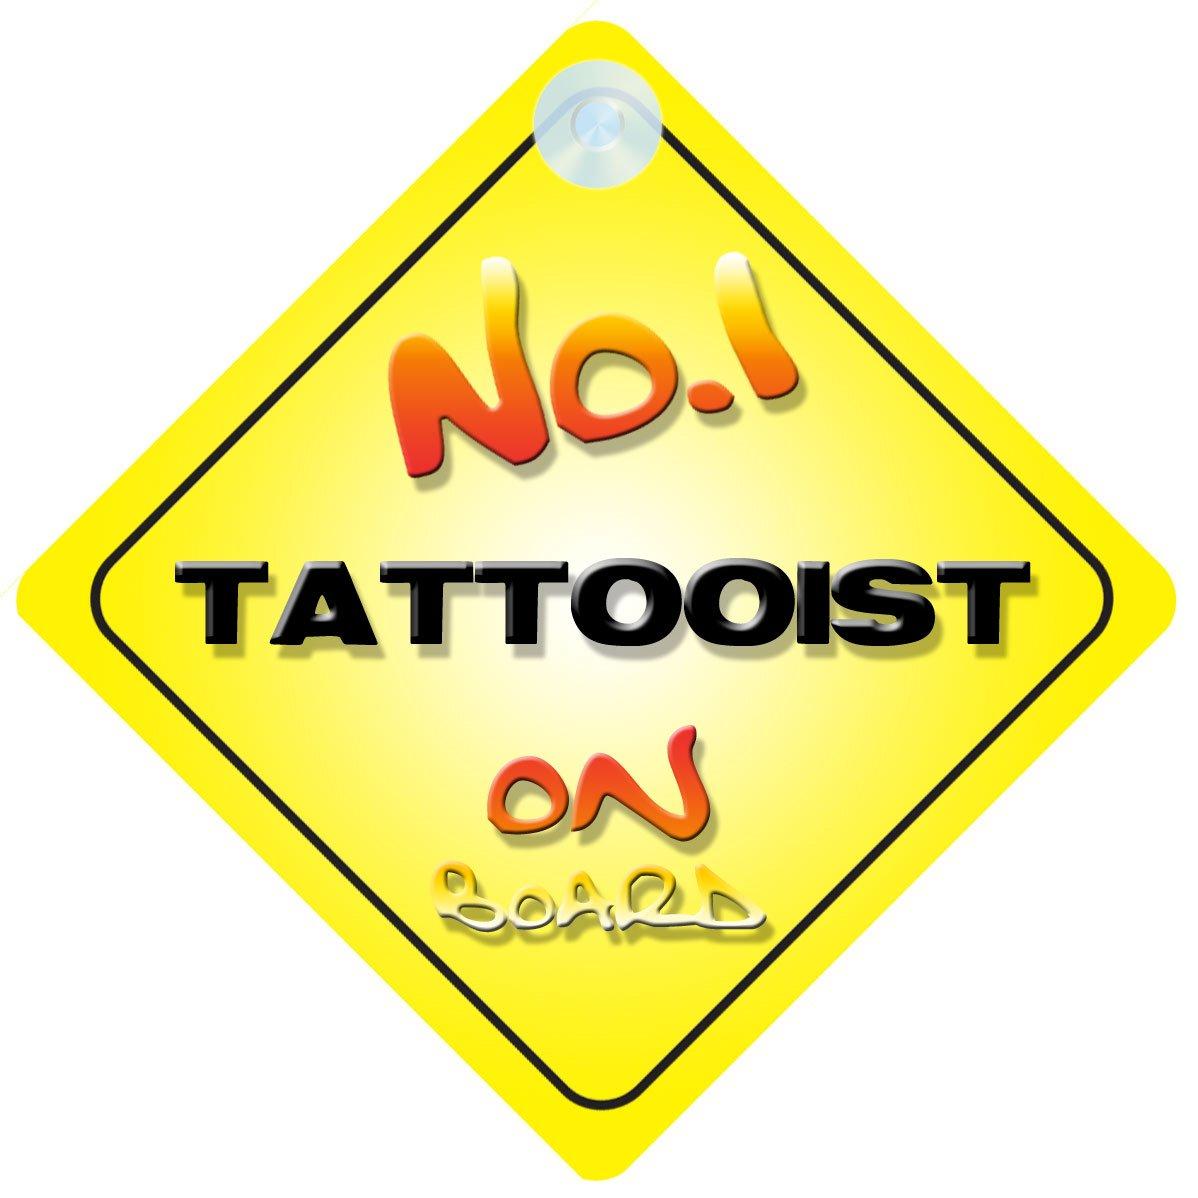 No.1 Tattooist on Board Novelty Car Sign New Job / Promotion / Novelty Gift / Present Quality Goods Ltd